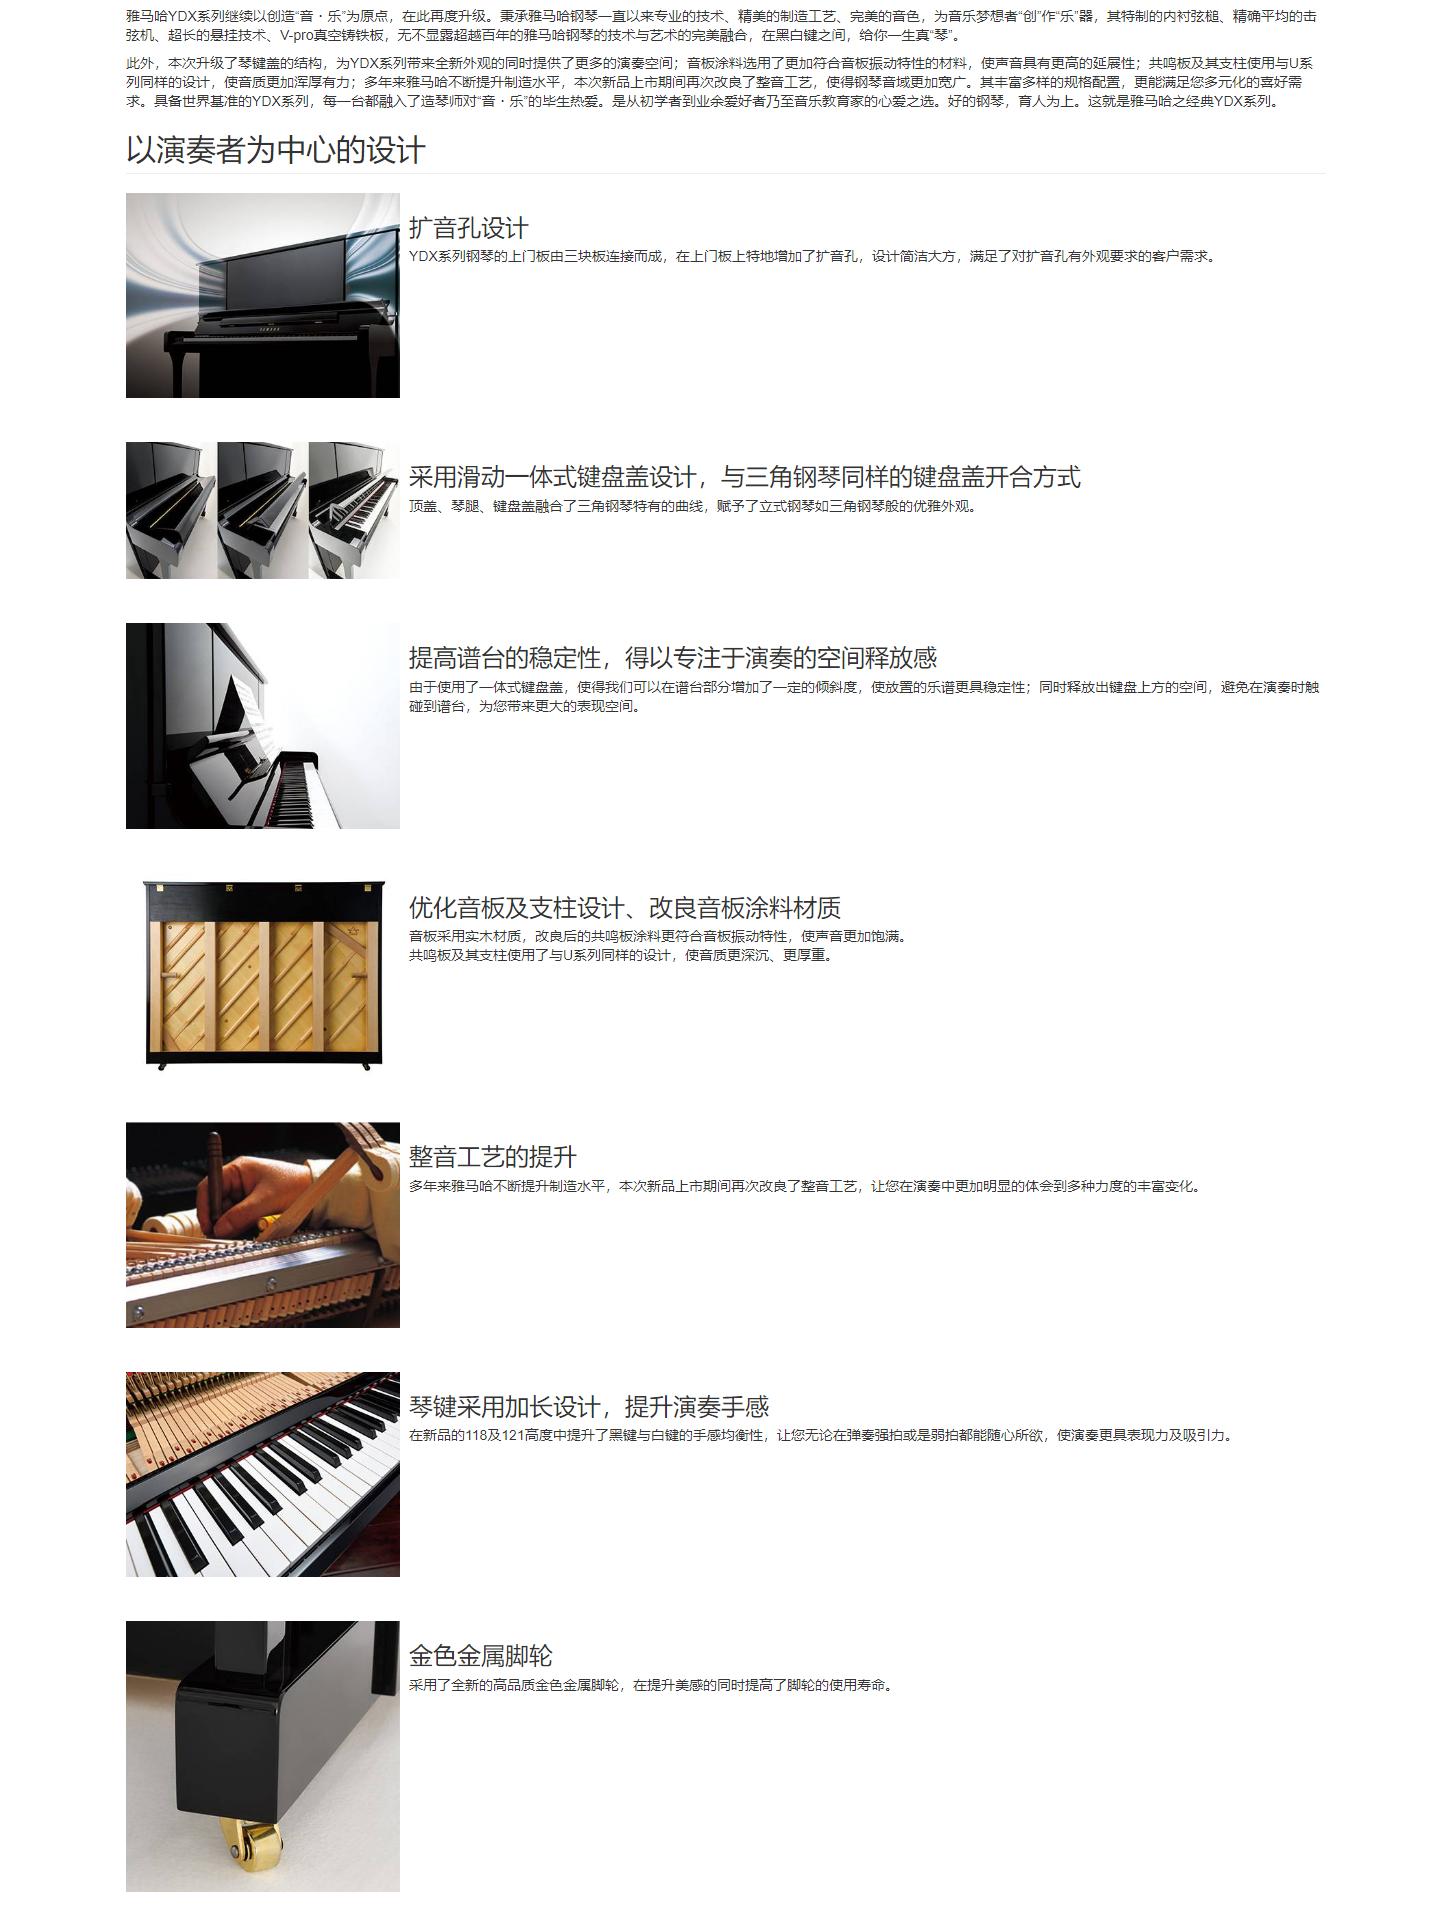 YDX系列 - 竞博jbo下载安卓中国.png